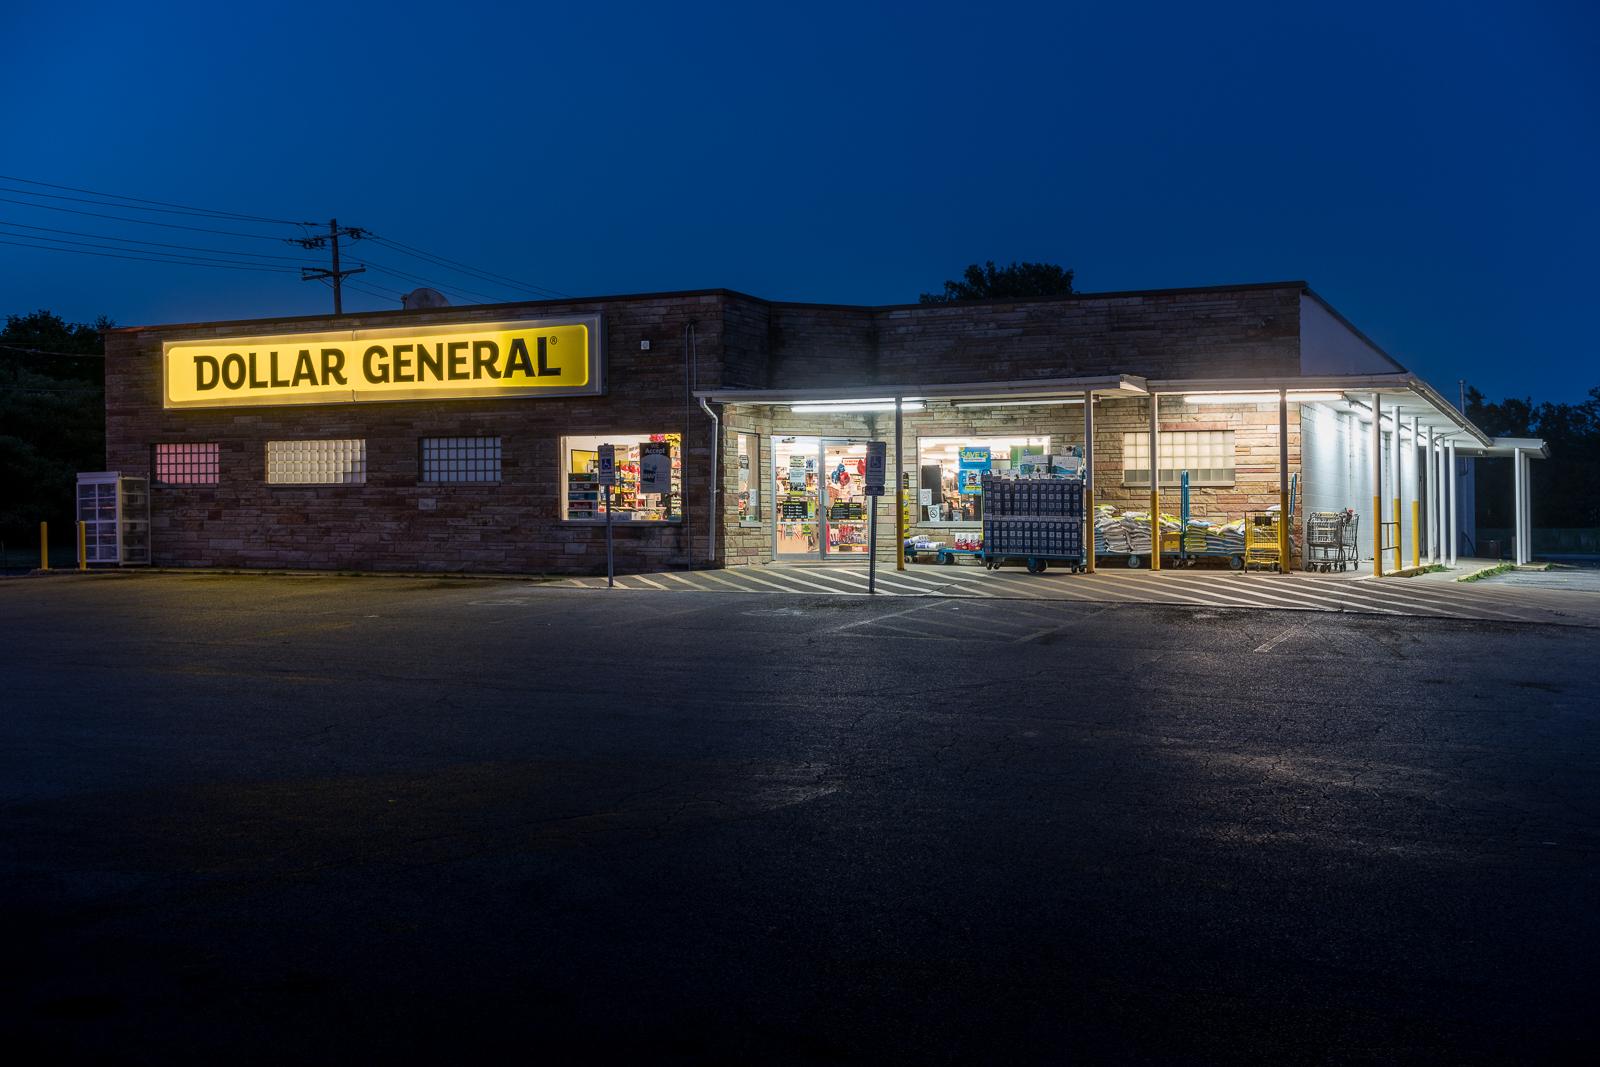 Dollar General, Olney, Illinois, 2017 © Nate Larson